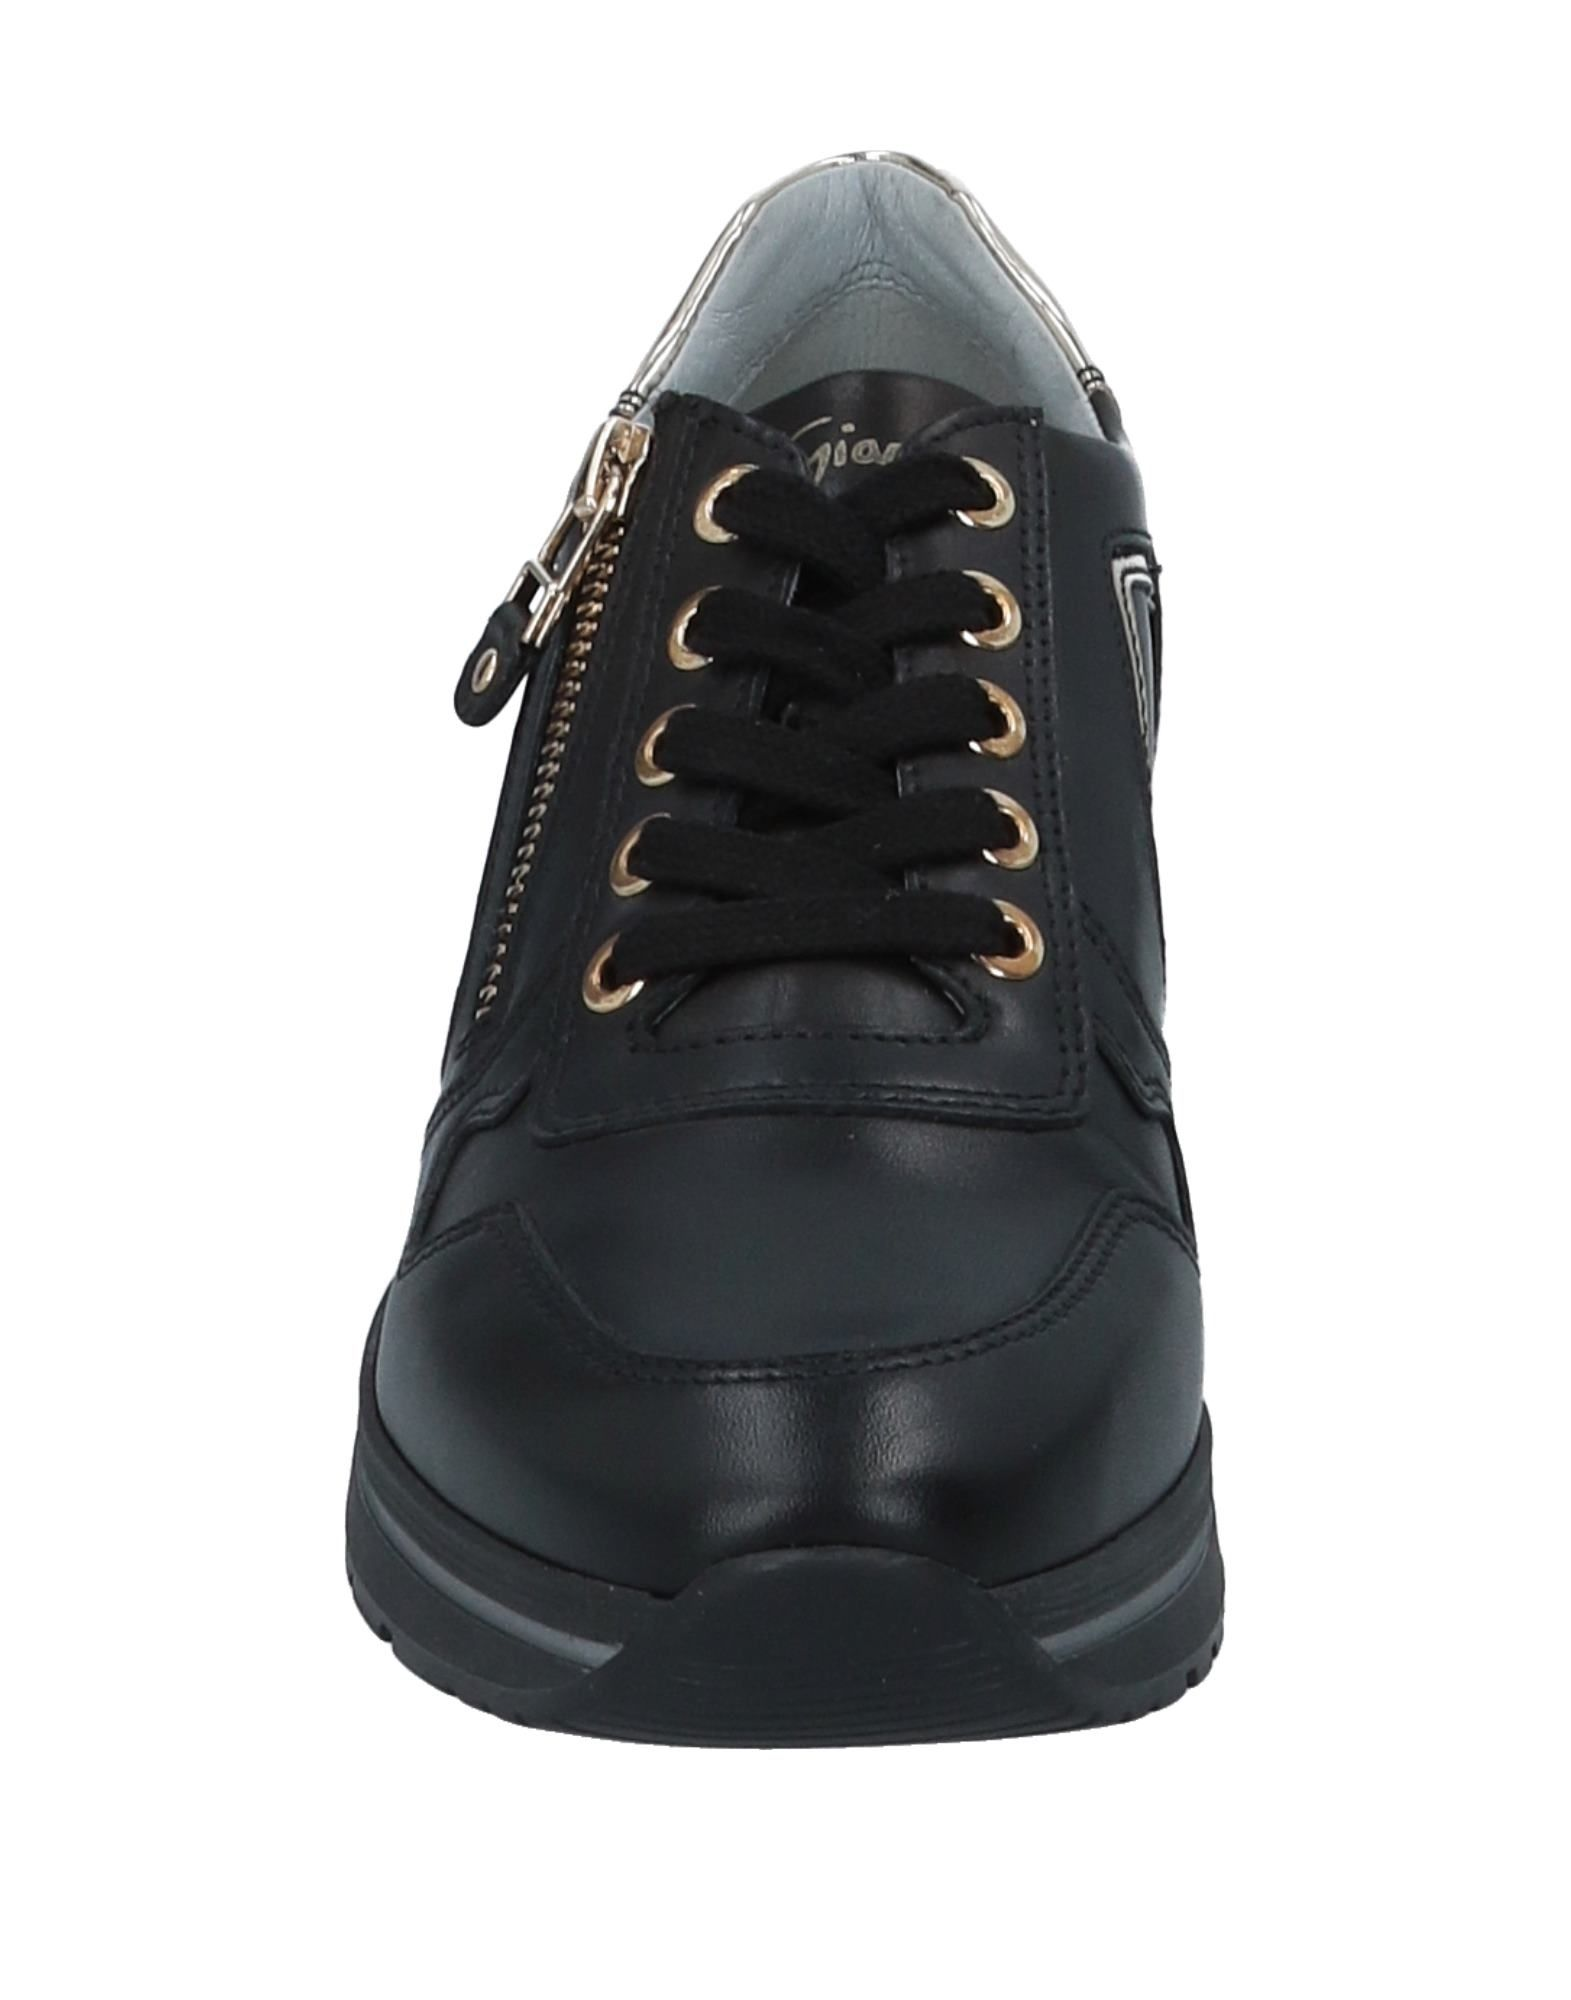 Nero Giardini Schuhe Sneakers Damen  11529557AJ Gute Qualität beliebte Schuhe Giardini 48b71b